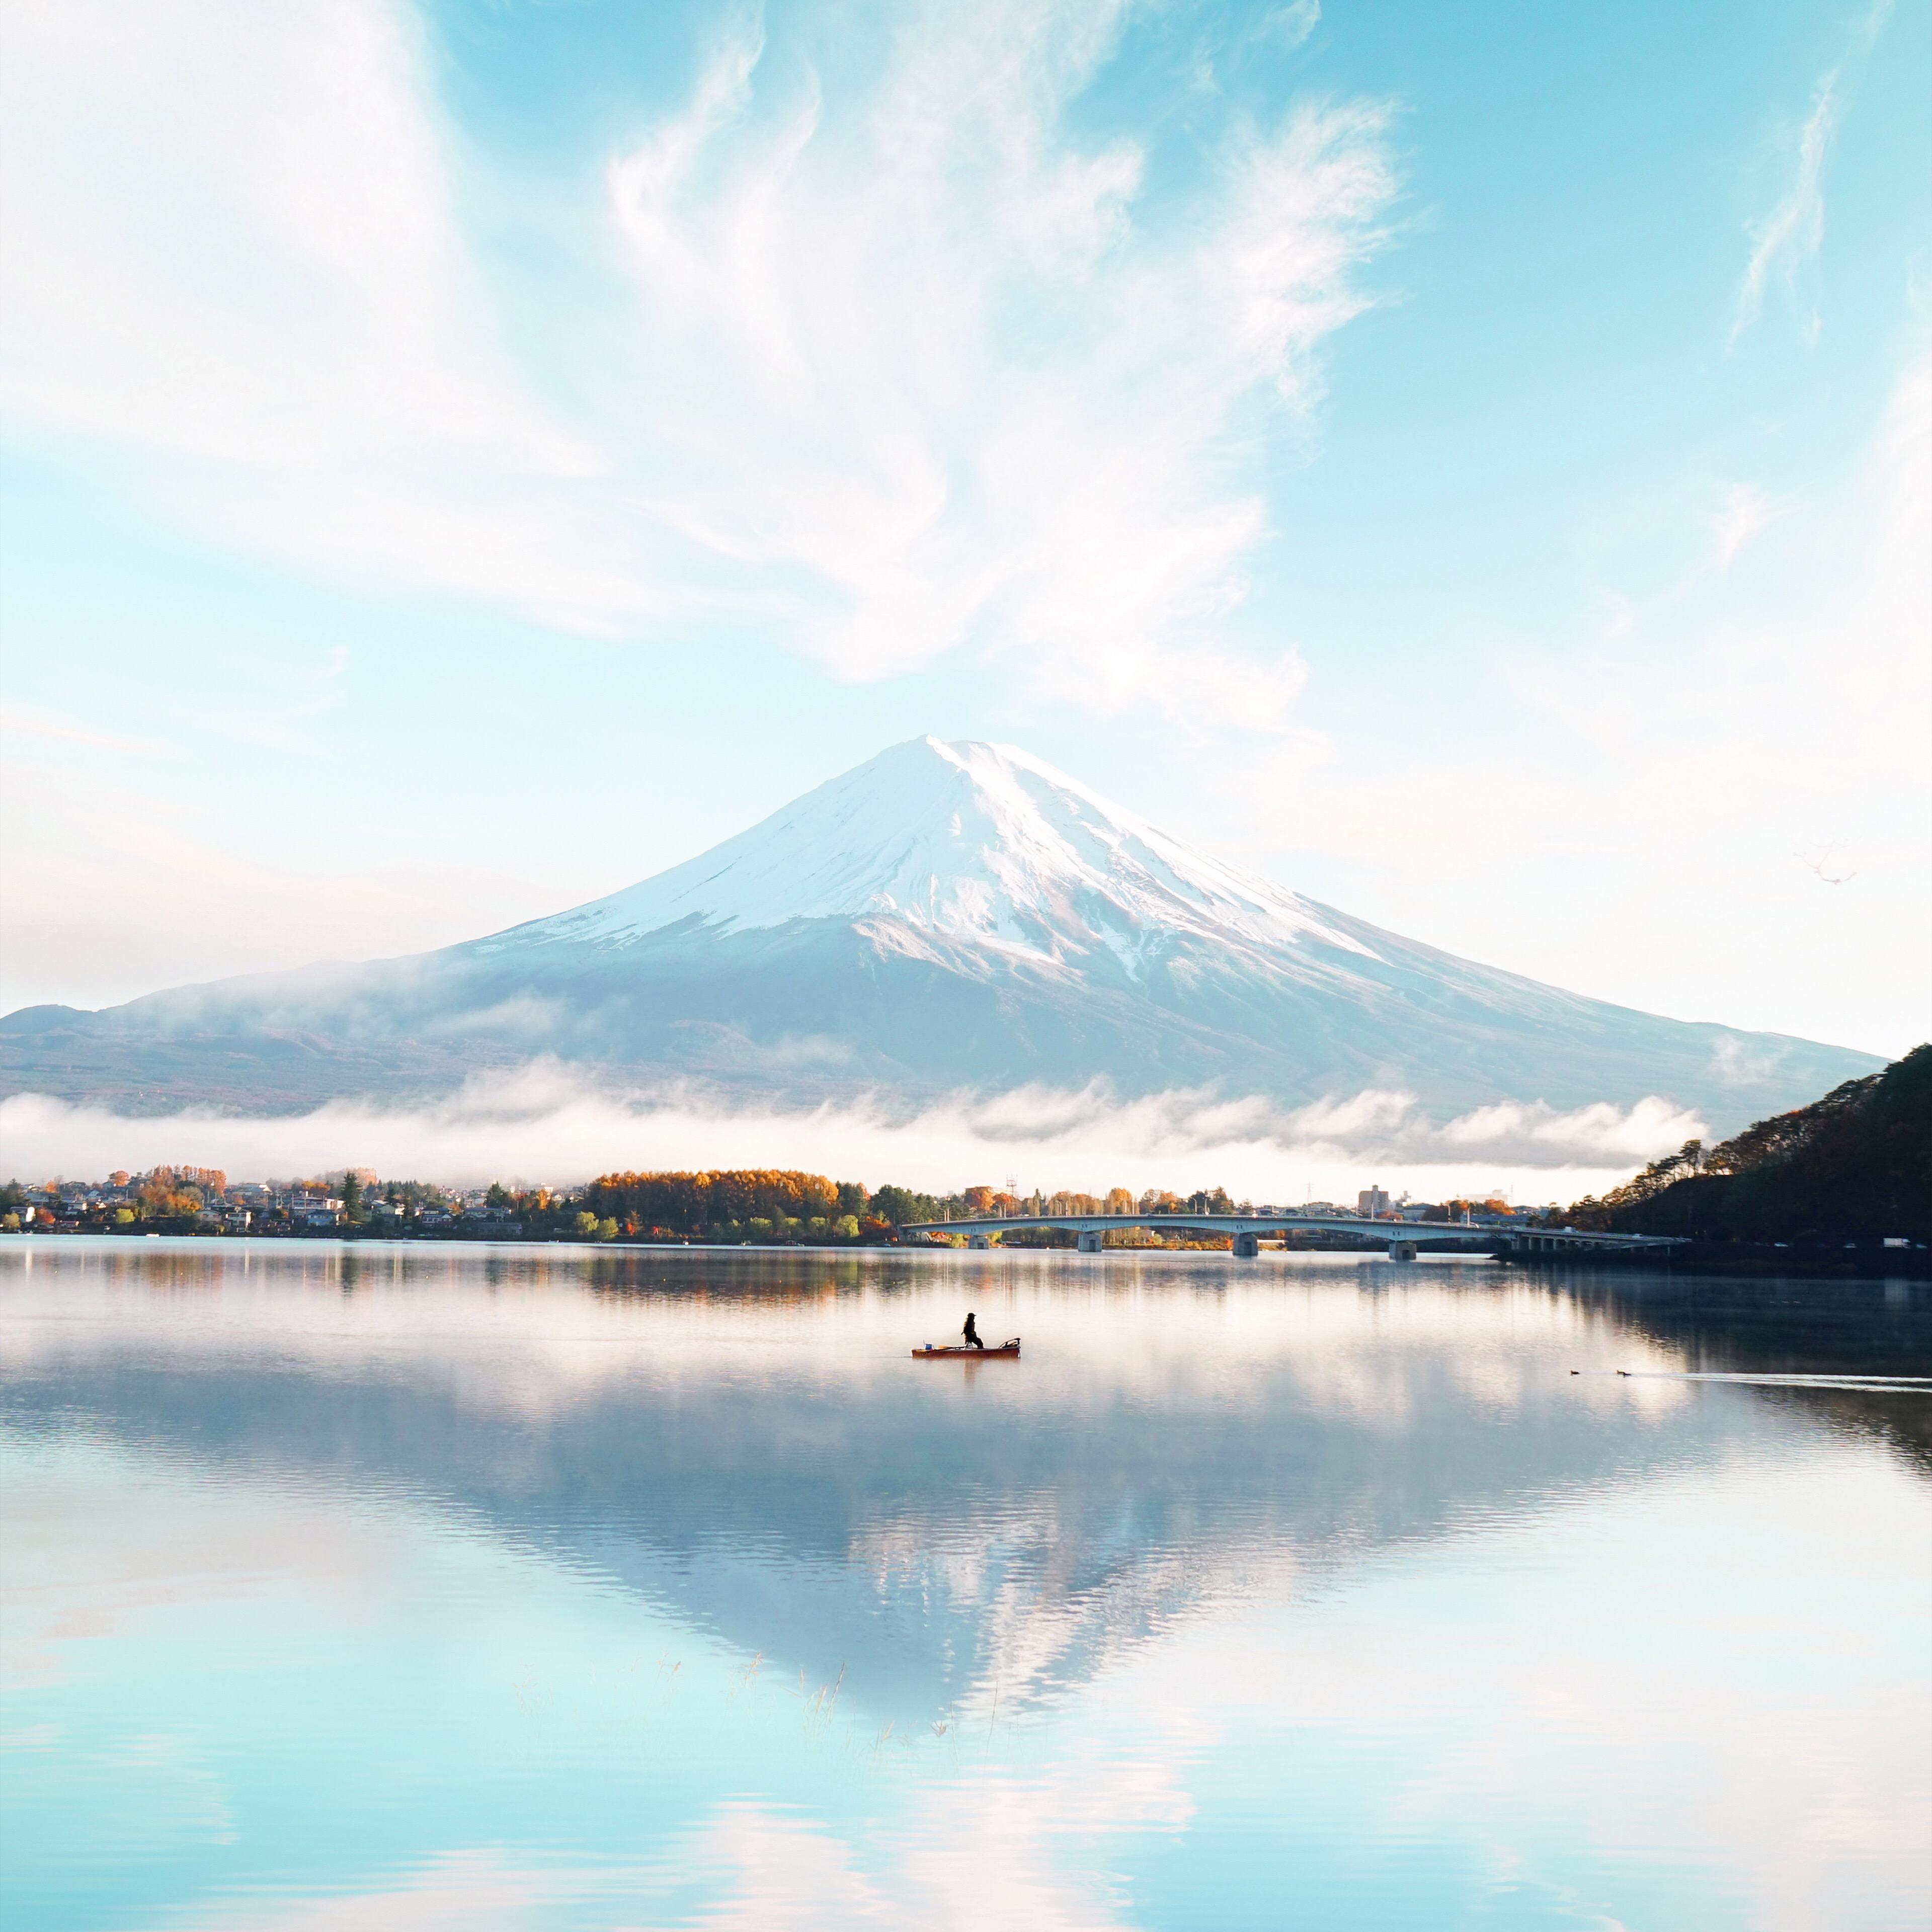 4k Resolution Wallpaper: 2560x1080 Mount Fuji Blue Bright Day 4k 2560x1080